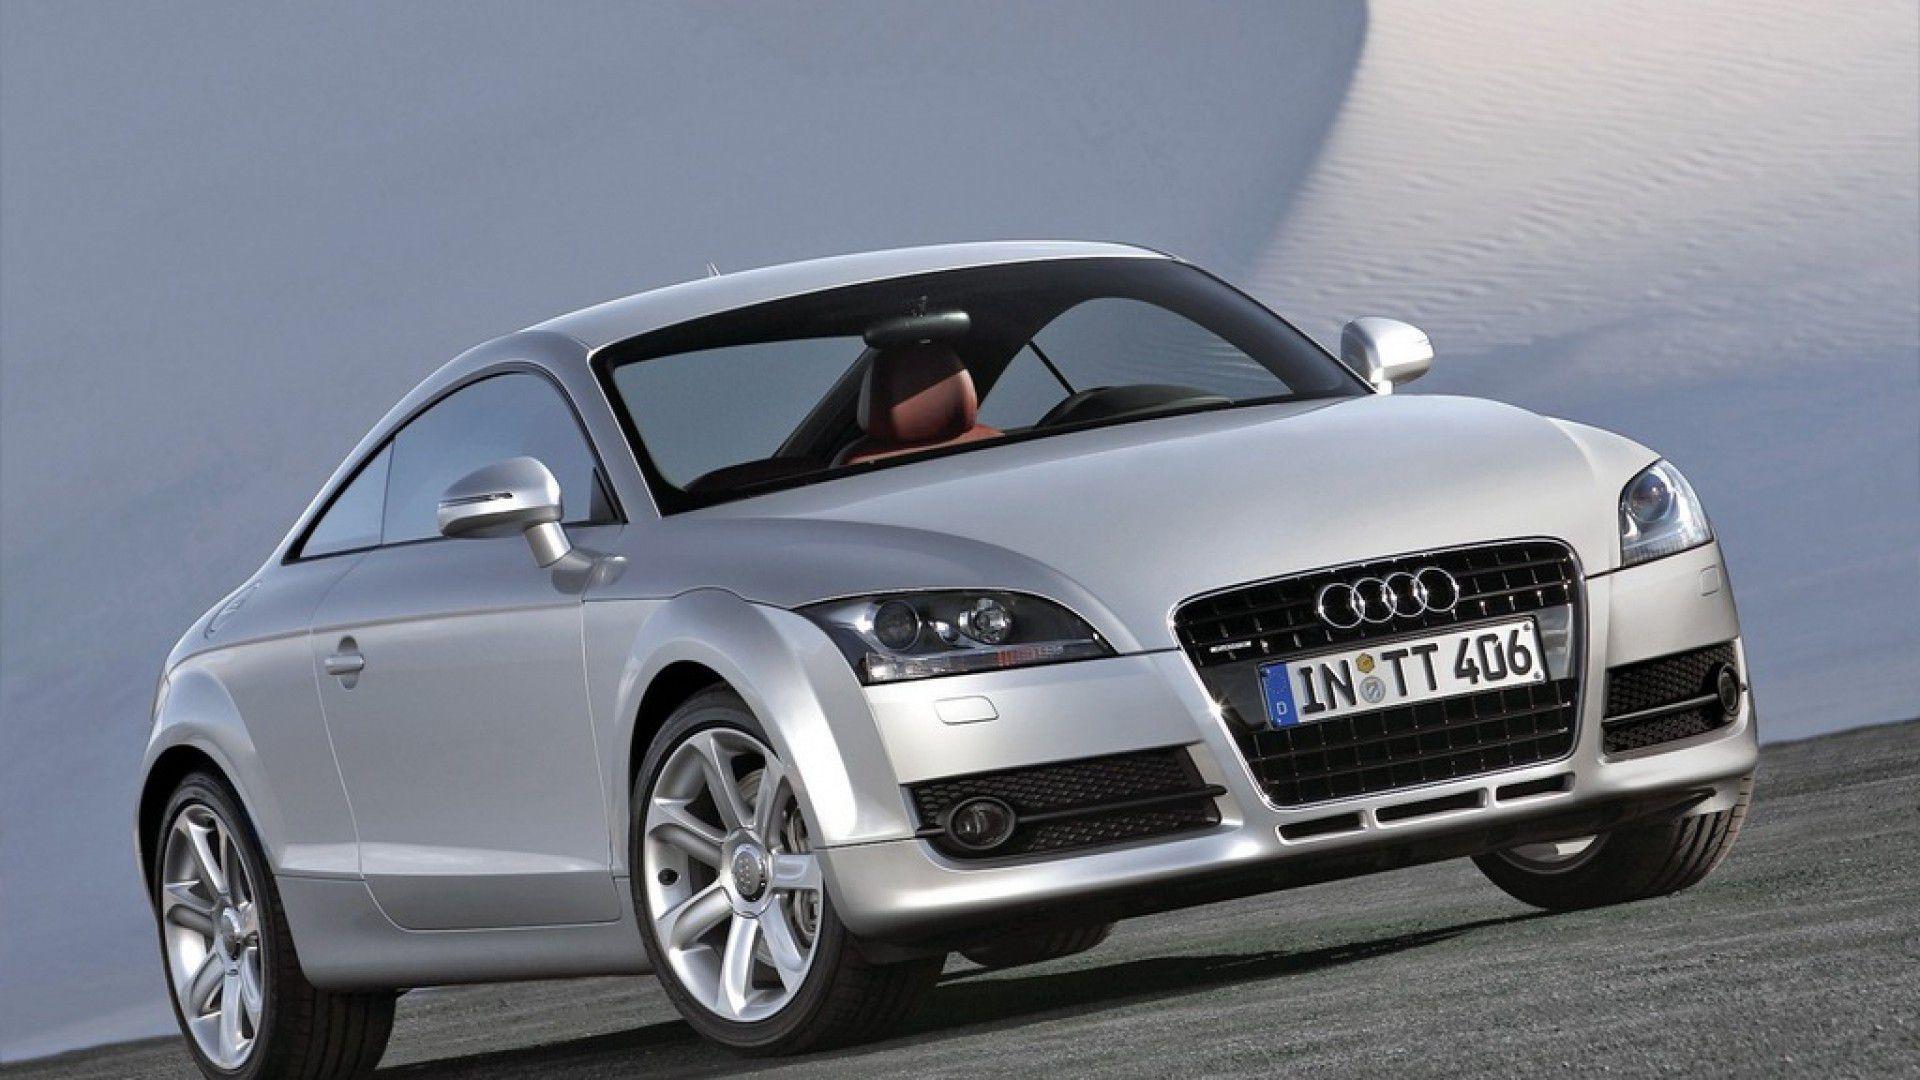 Audi TT (2006 to Present)